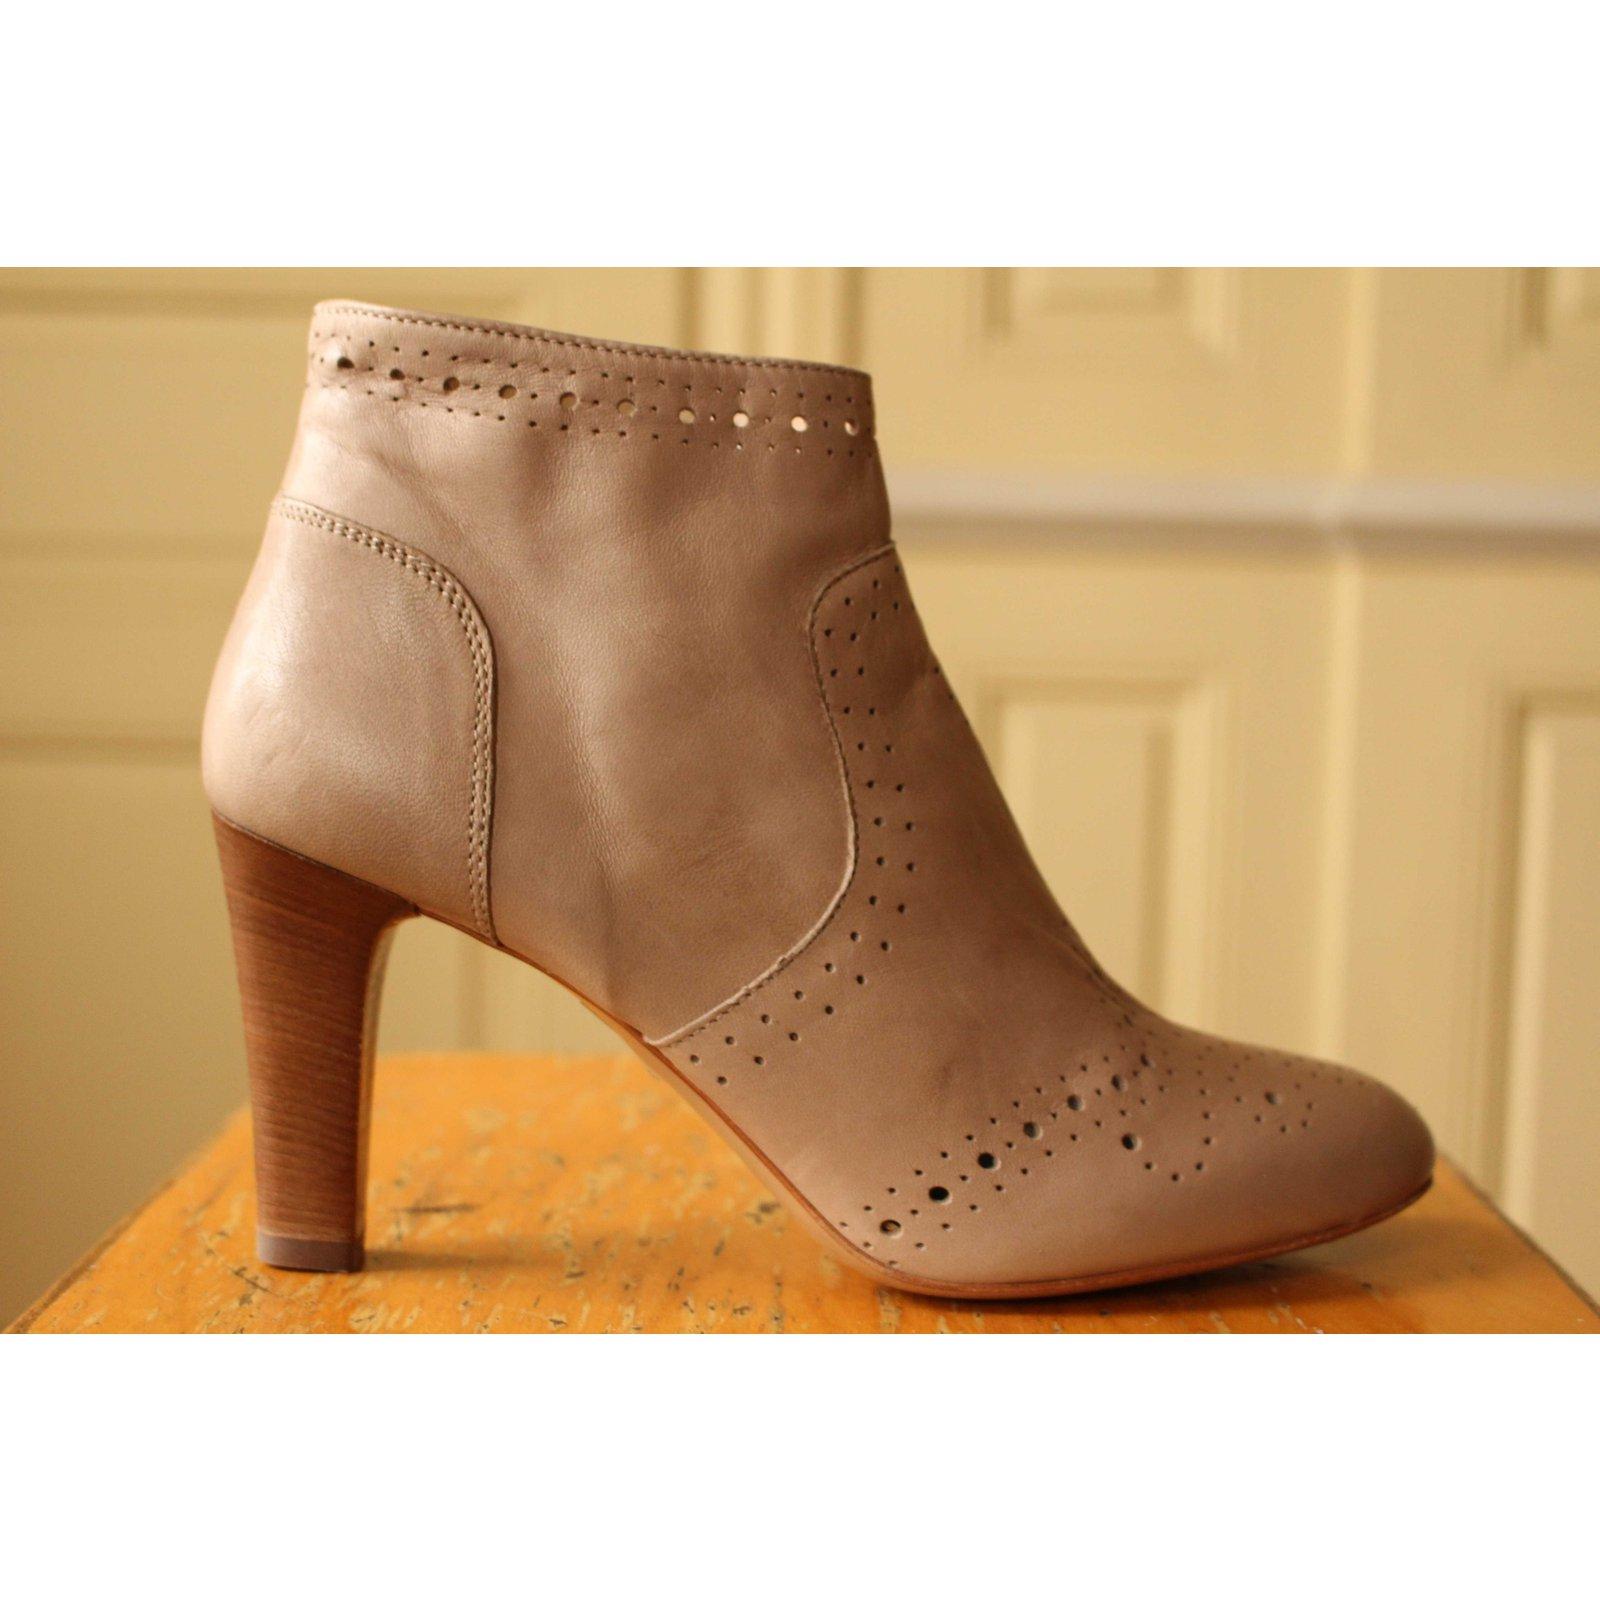 Autre Marque Flowered toe boots Ankle Boots Leather Beige ref.101583 - Joli Closet